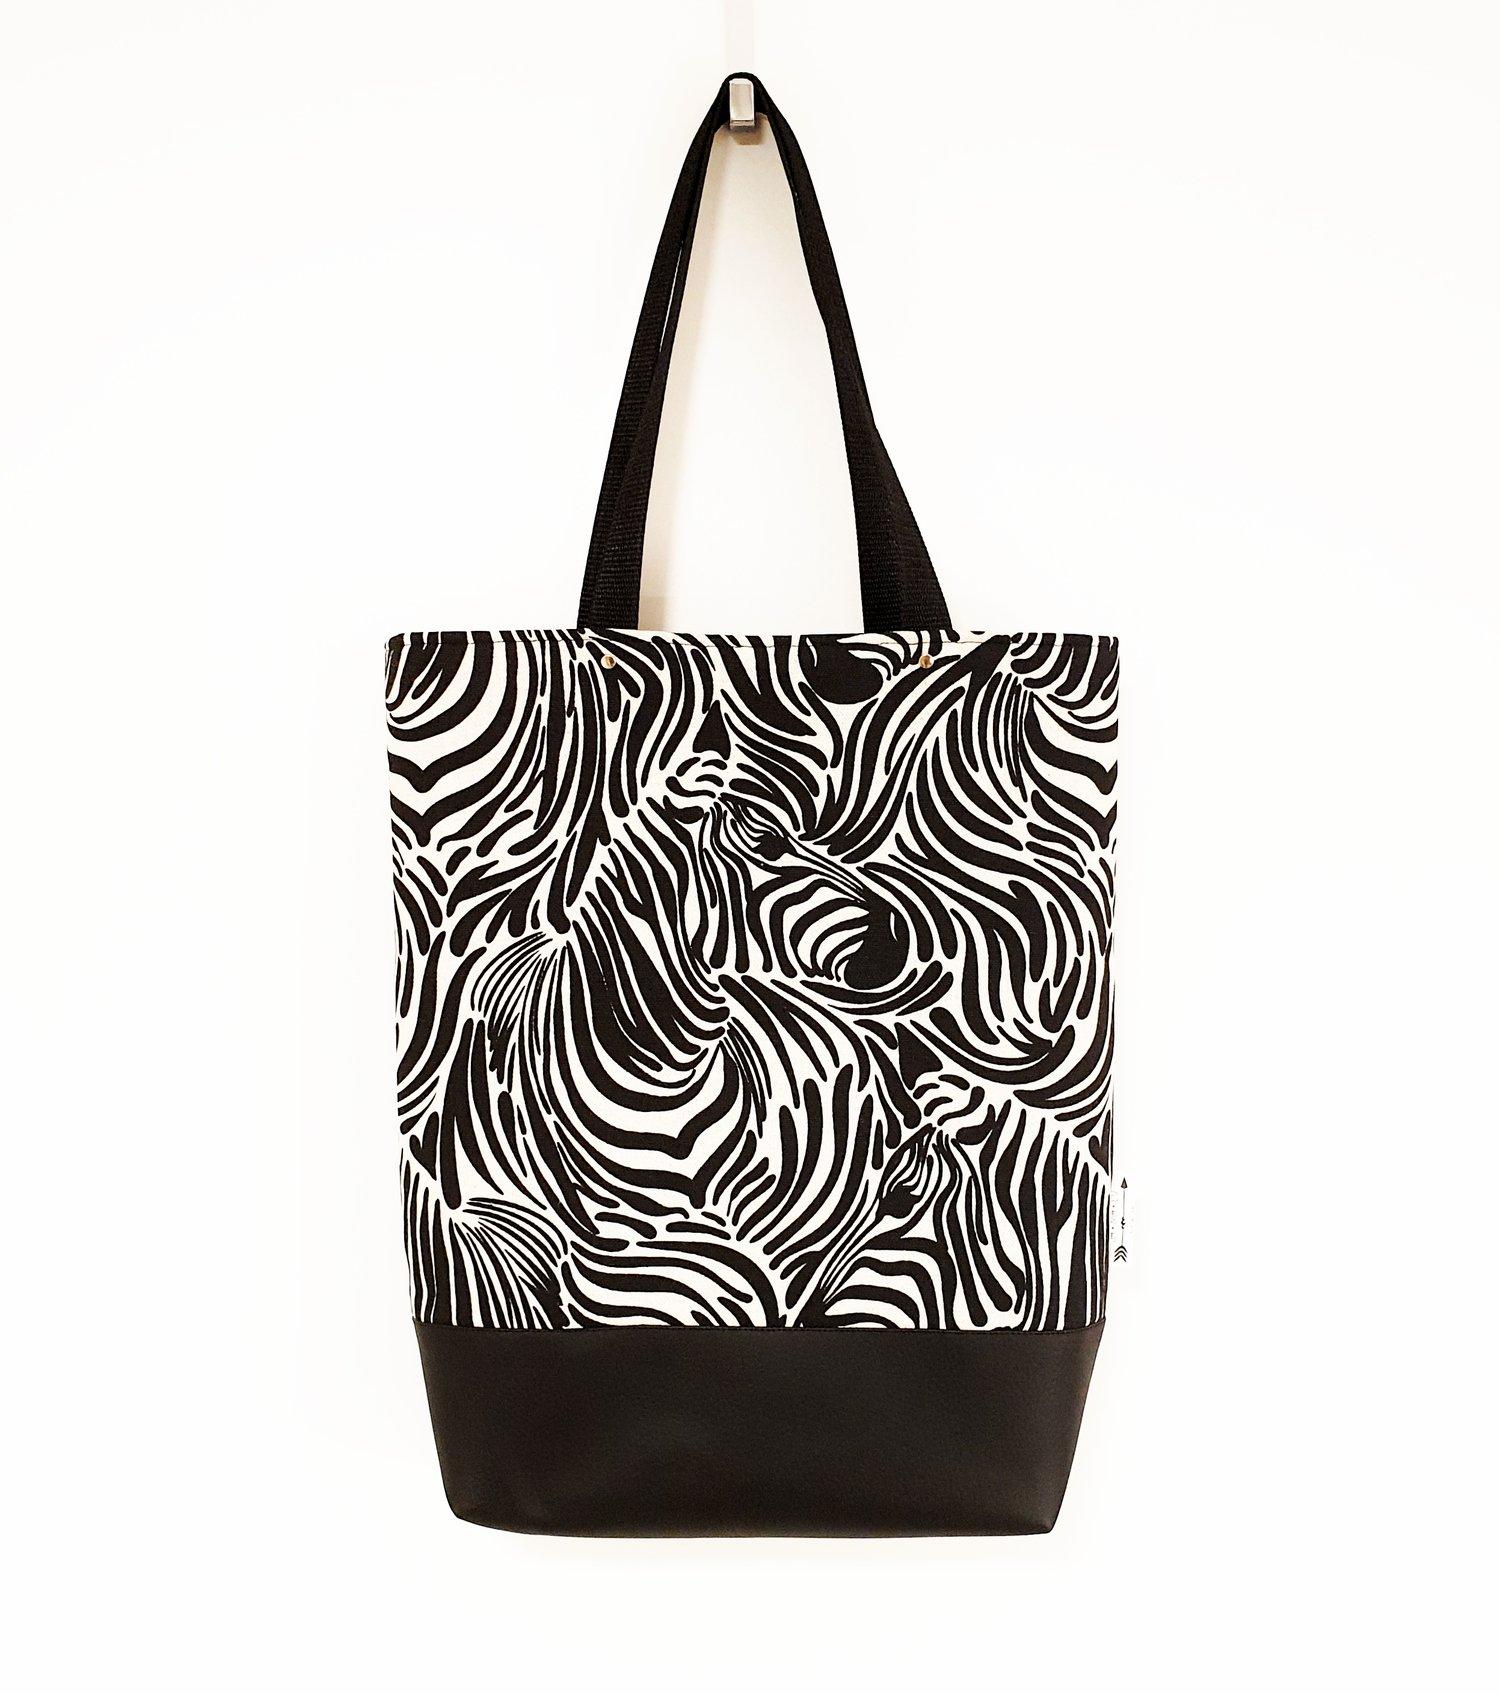 Image of Torba Zebra / Shoulder bag Zebra